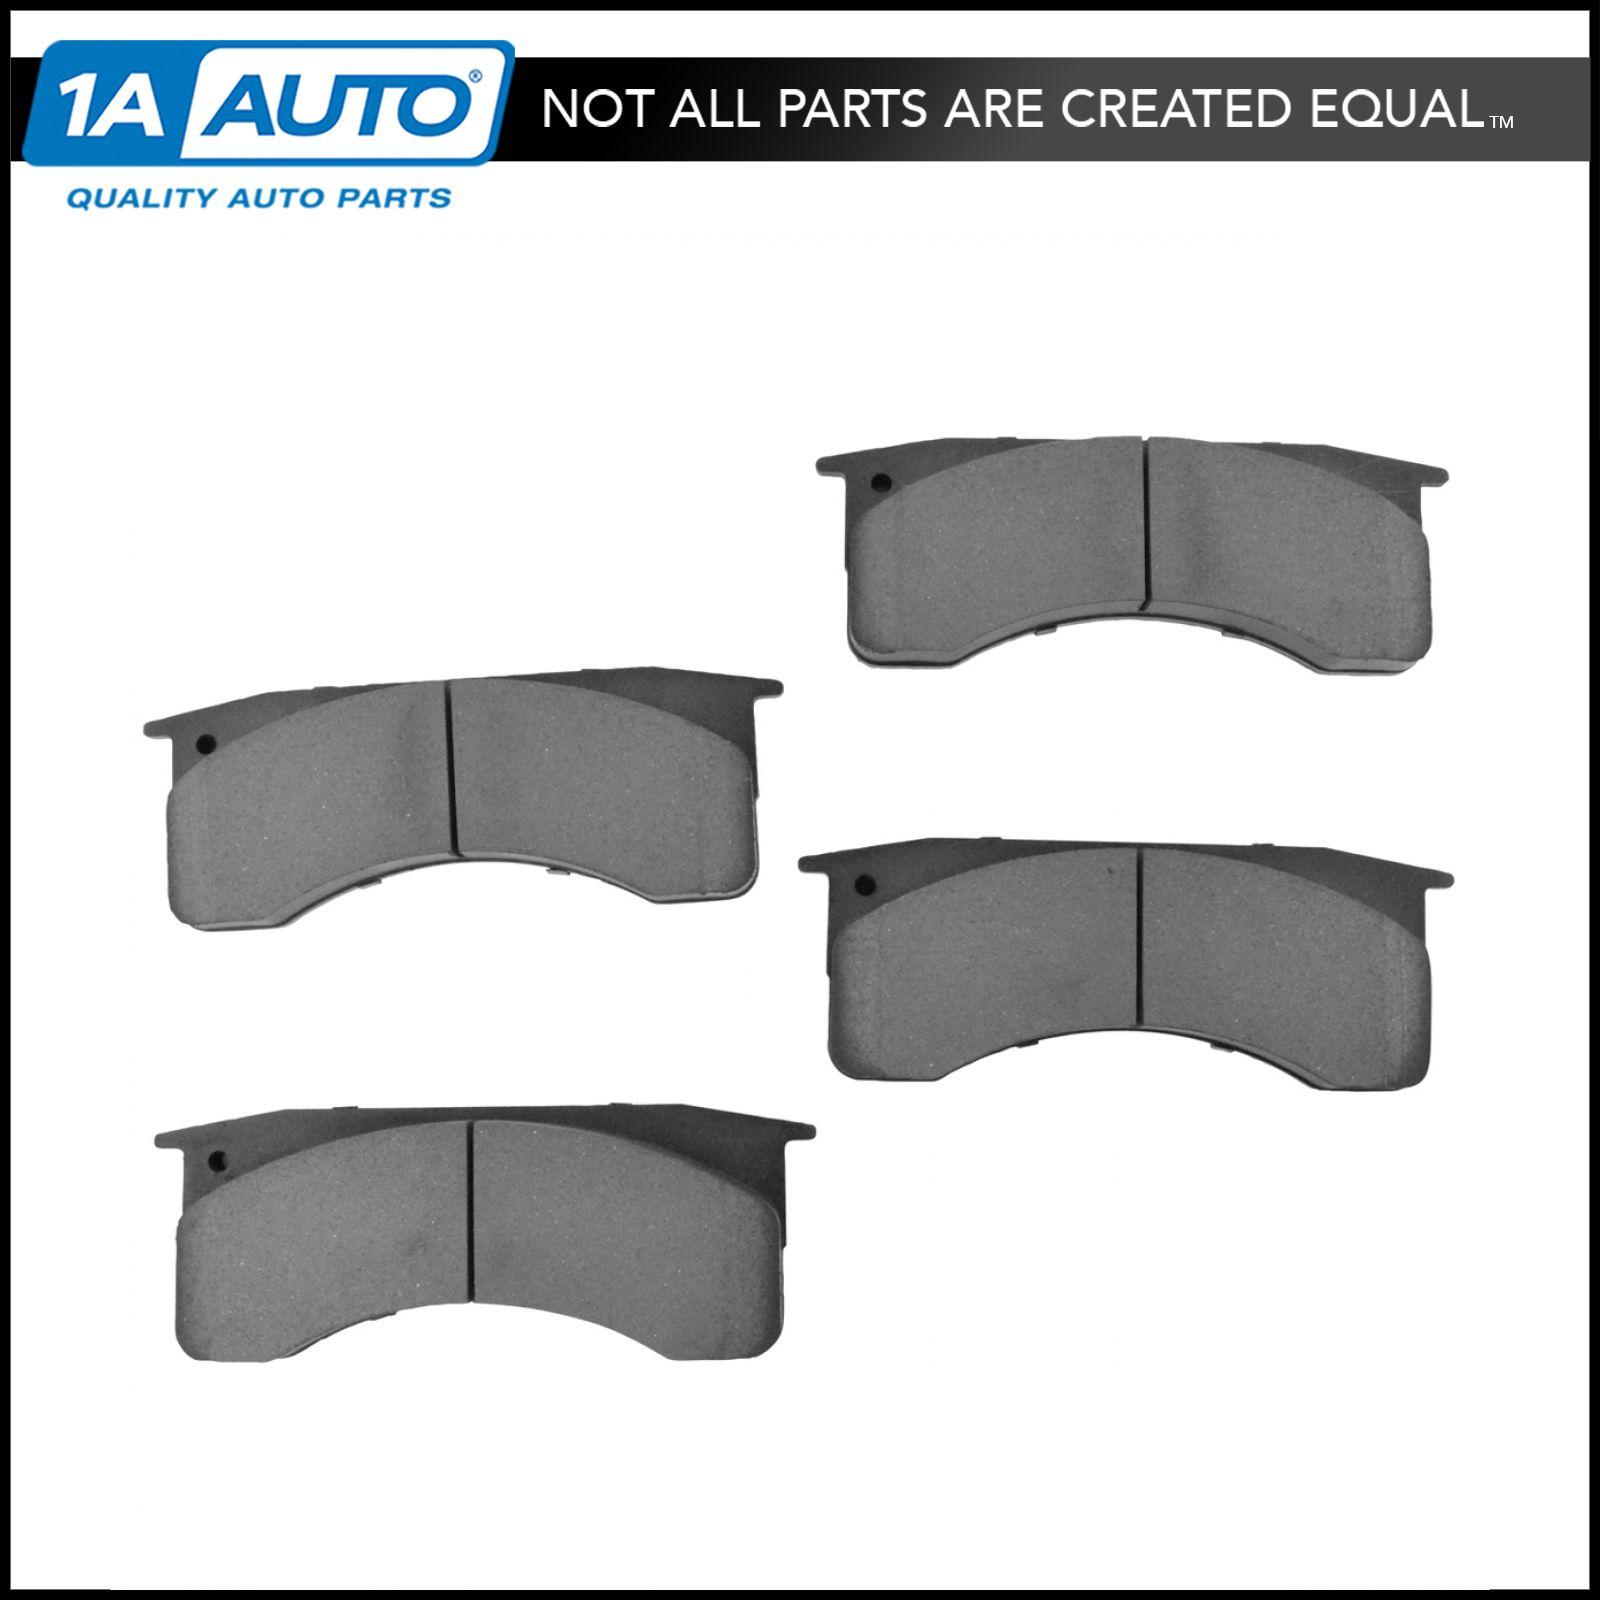 hight resolution of nakamoto posi ceramic brake pad set rear kit for ford f650 f750 gmc c6000 c7000